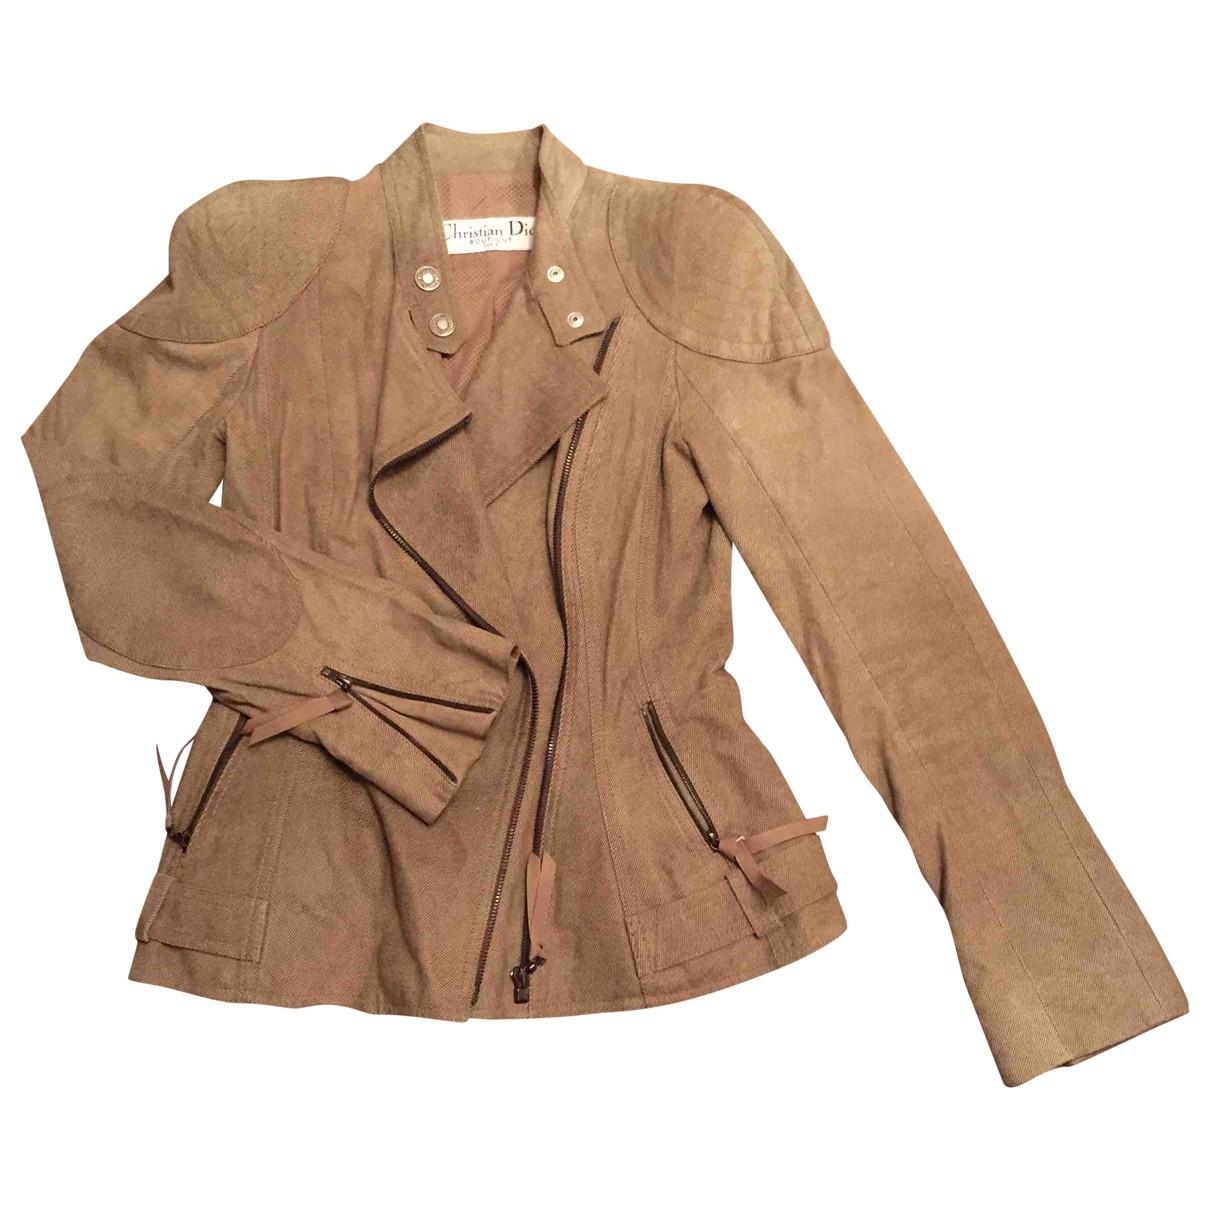 Dior \N Beige Leather jacket for Women 36 FR